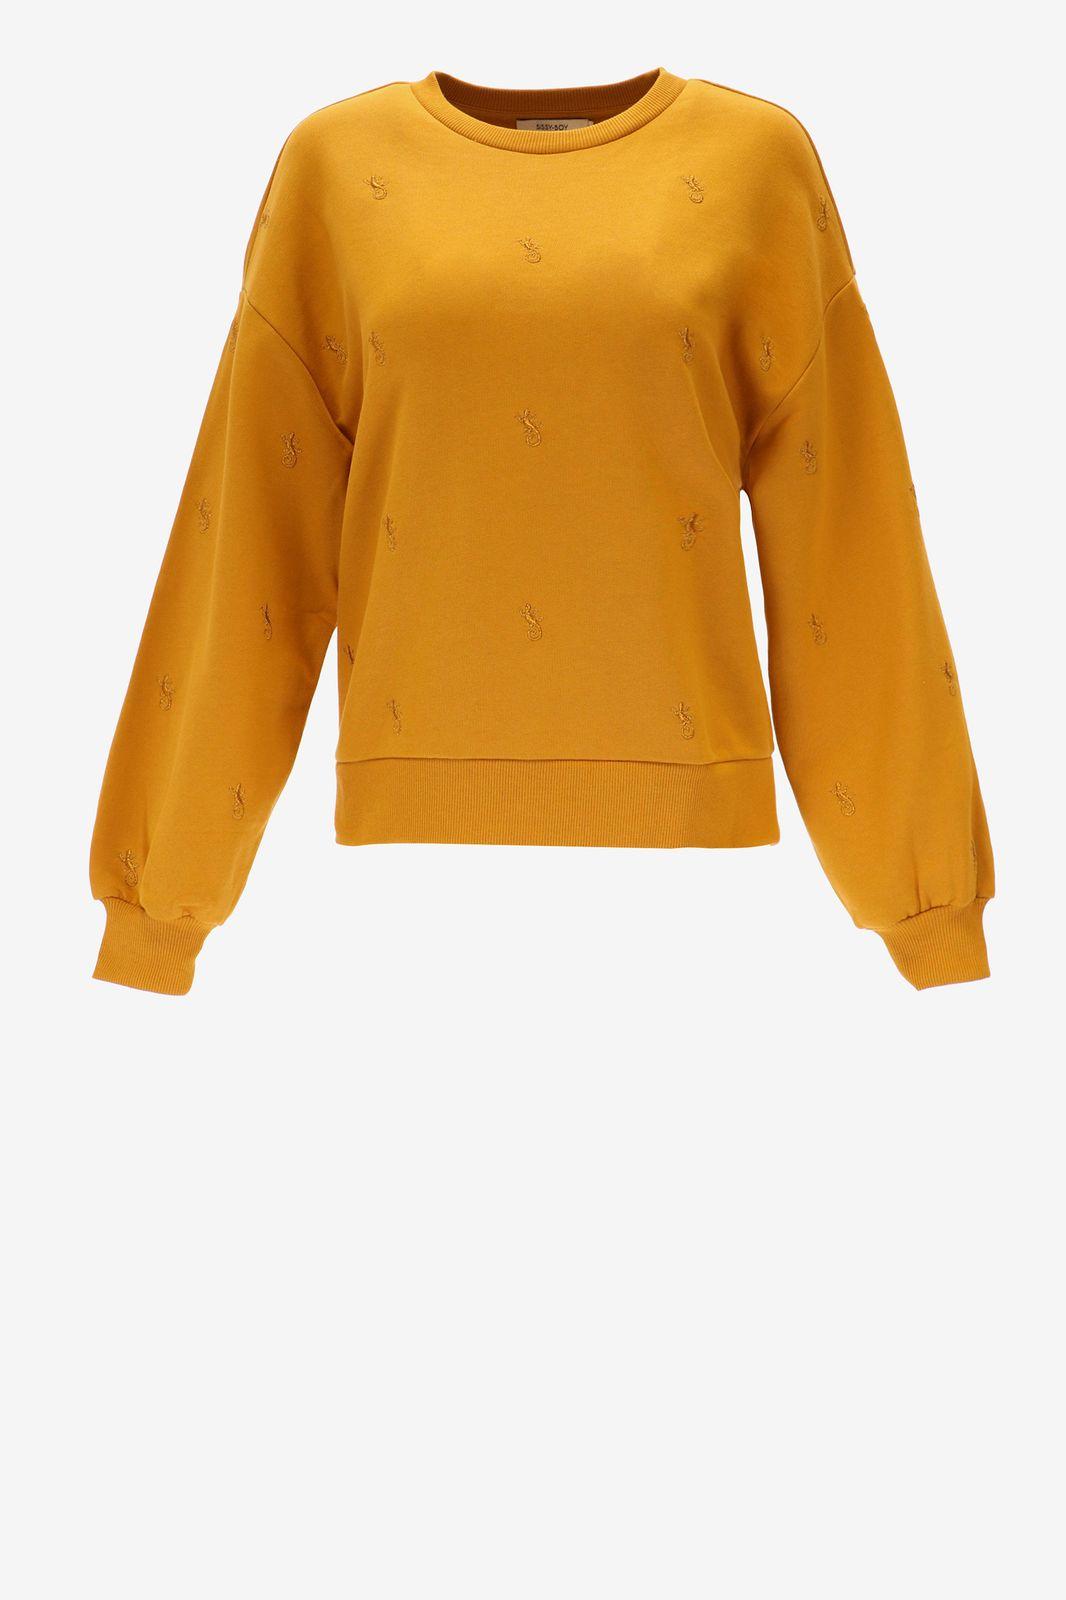 Okergele trui met geborduurde details